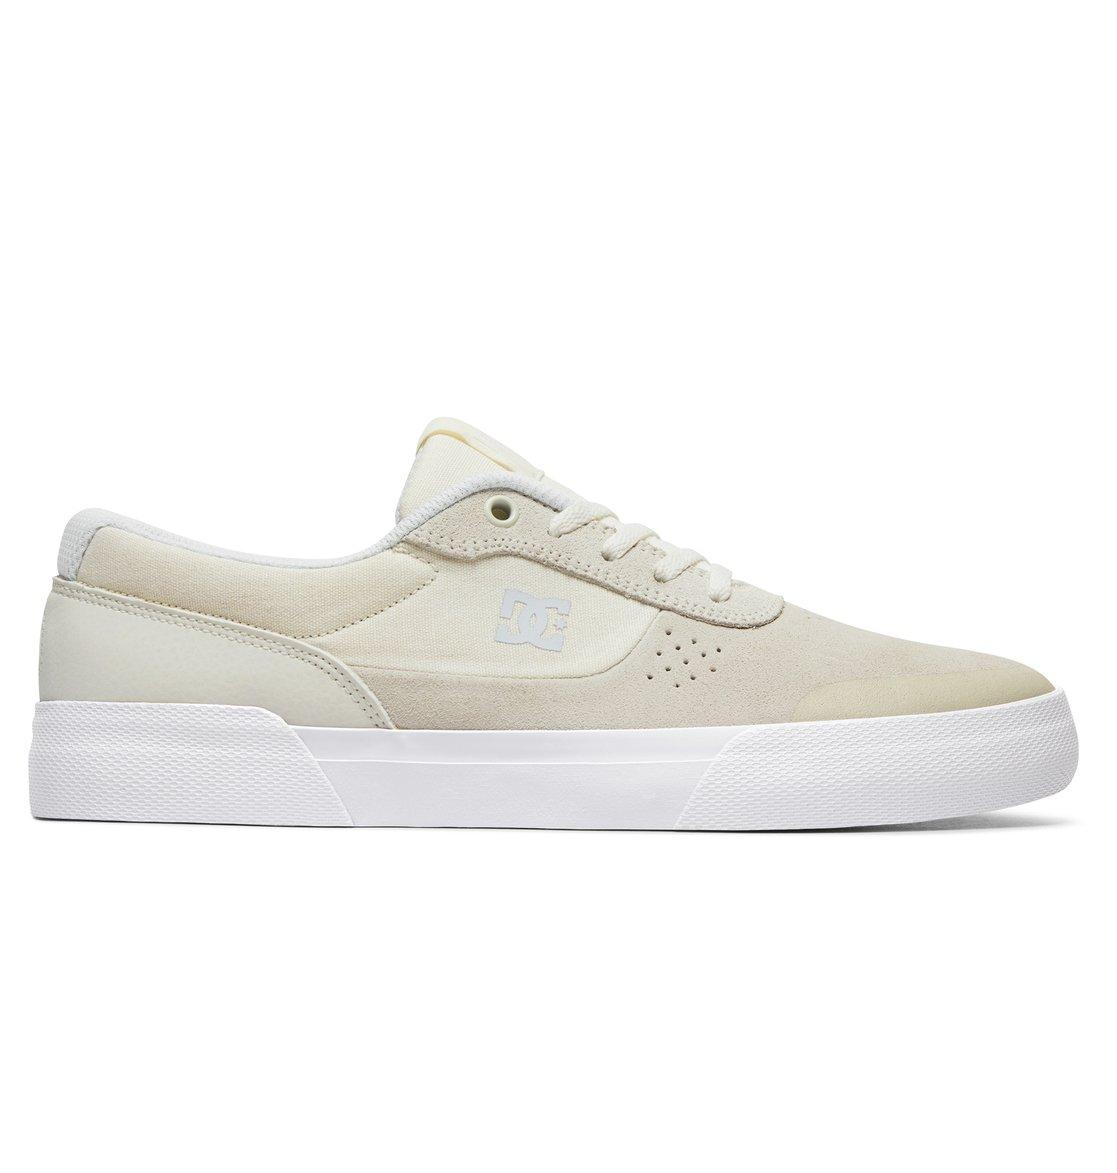 dc shoes Switch Plus S - Scarpe da skate da Uomo - Brown - DC Shoes